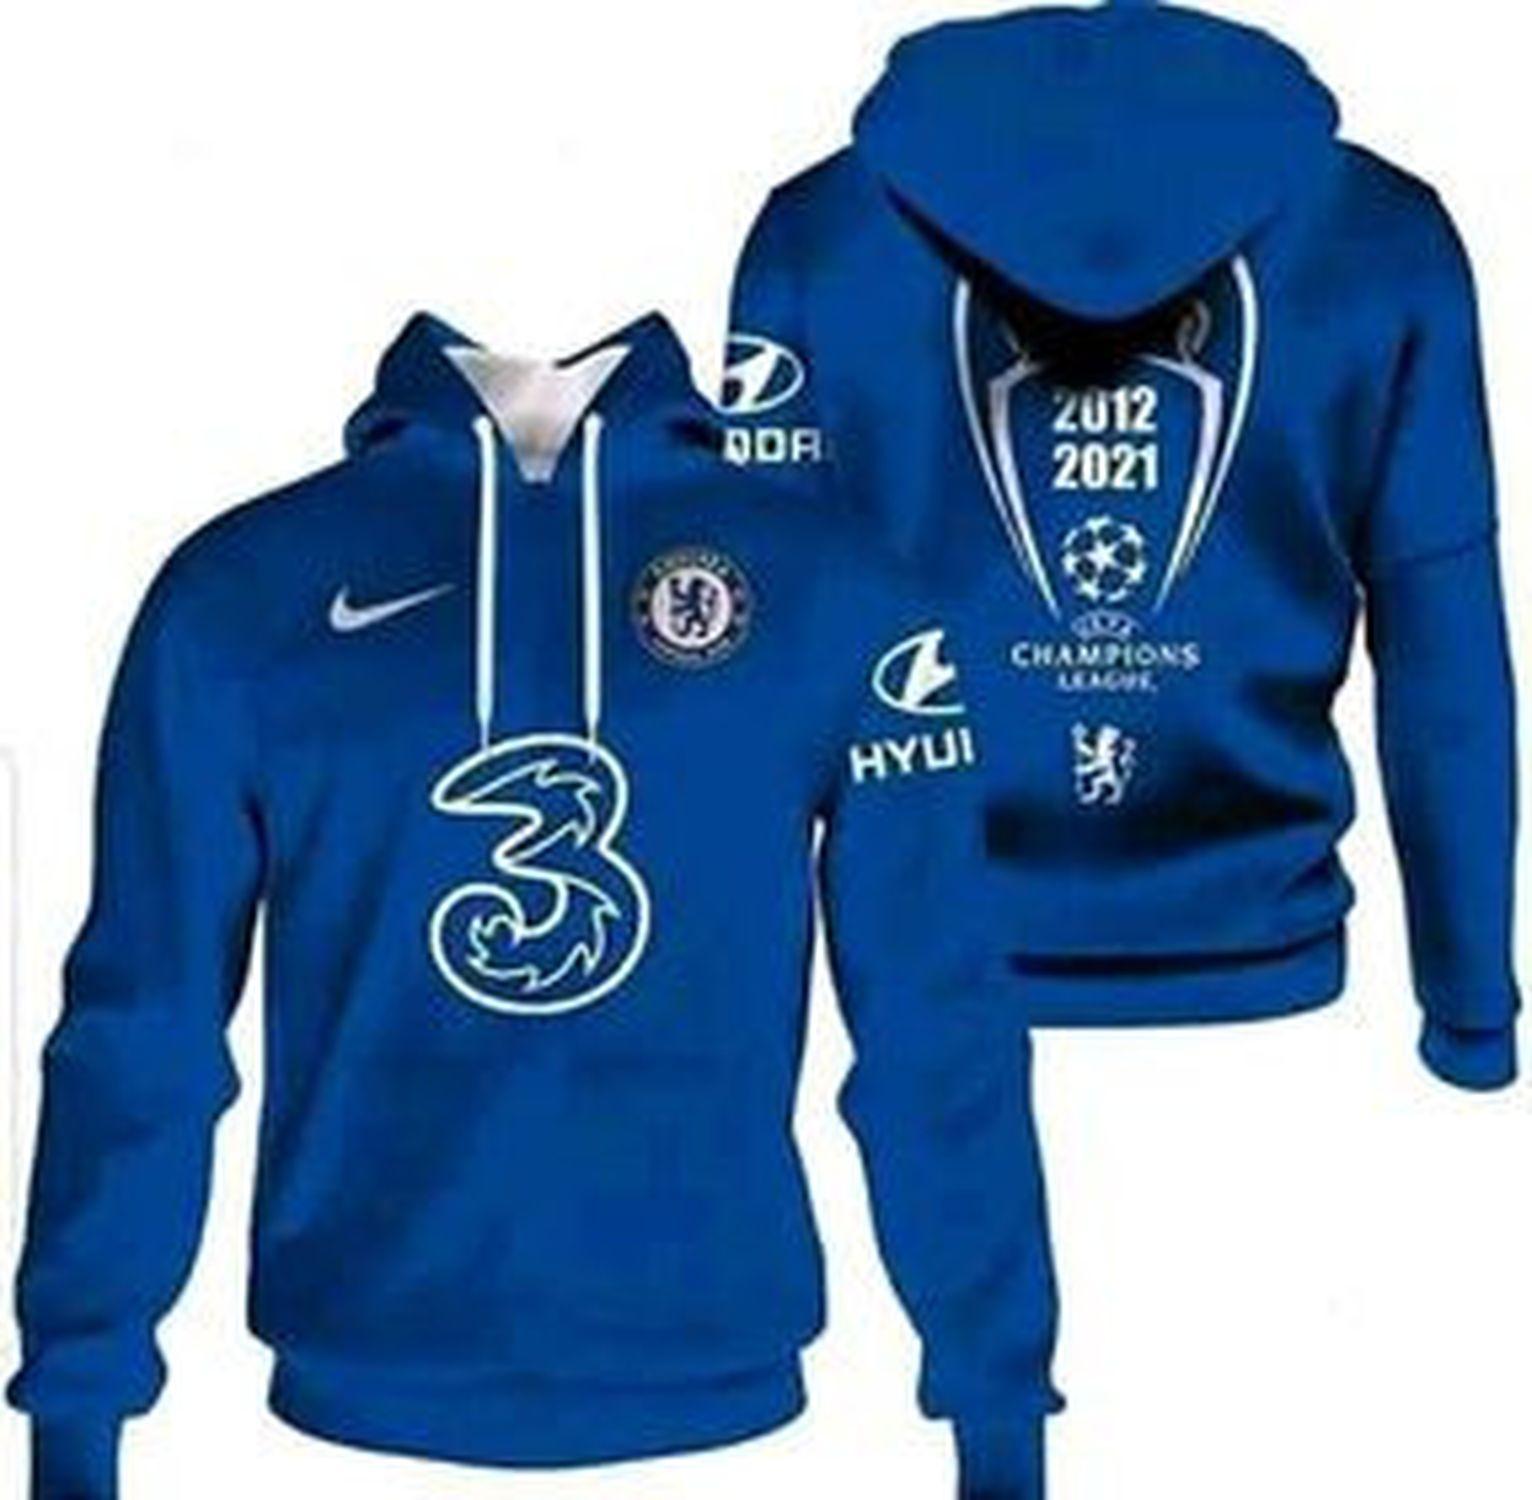 Chelsea 2012 2021 champions league hoodie